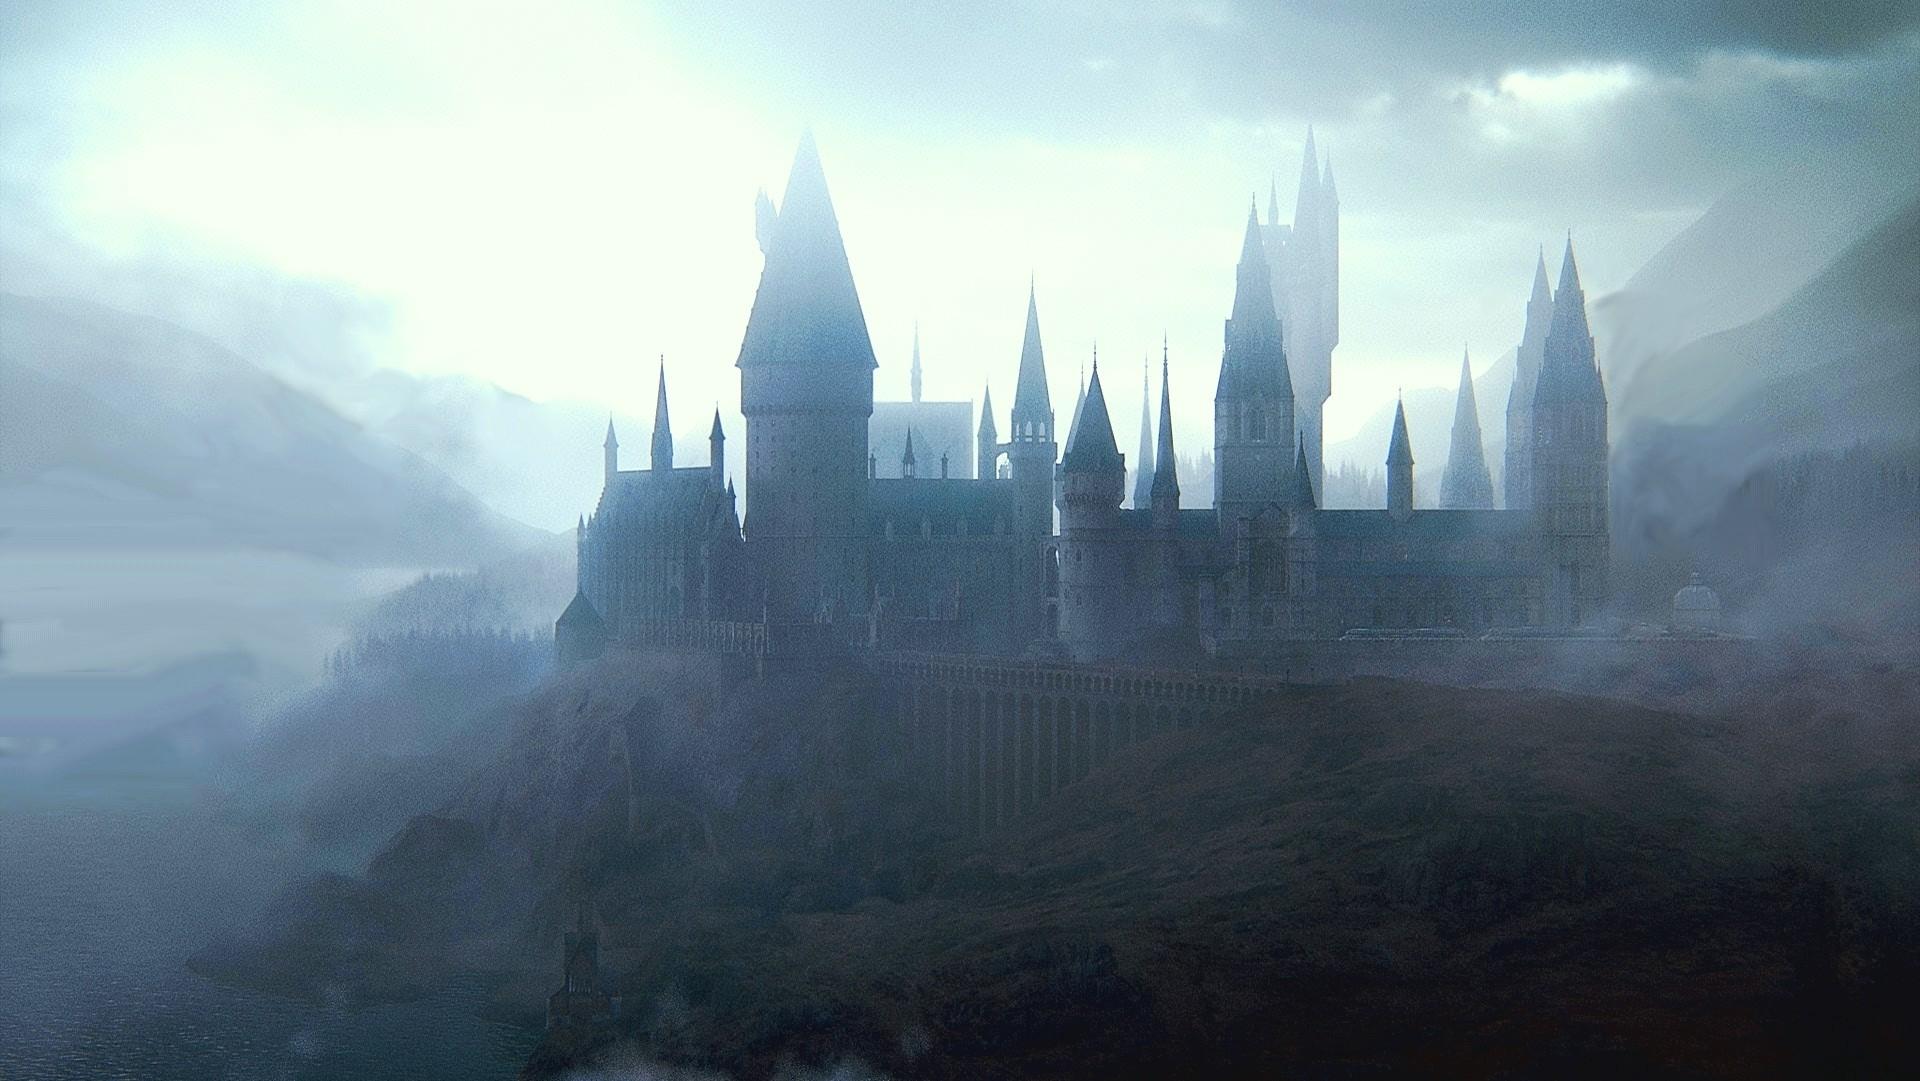 hogwarts wallpaper hd (64+ images)